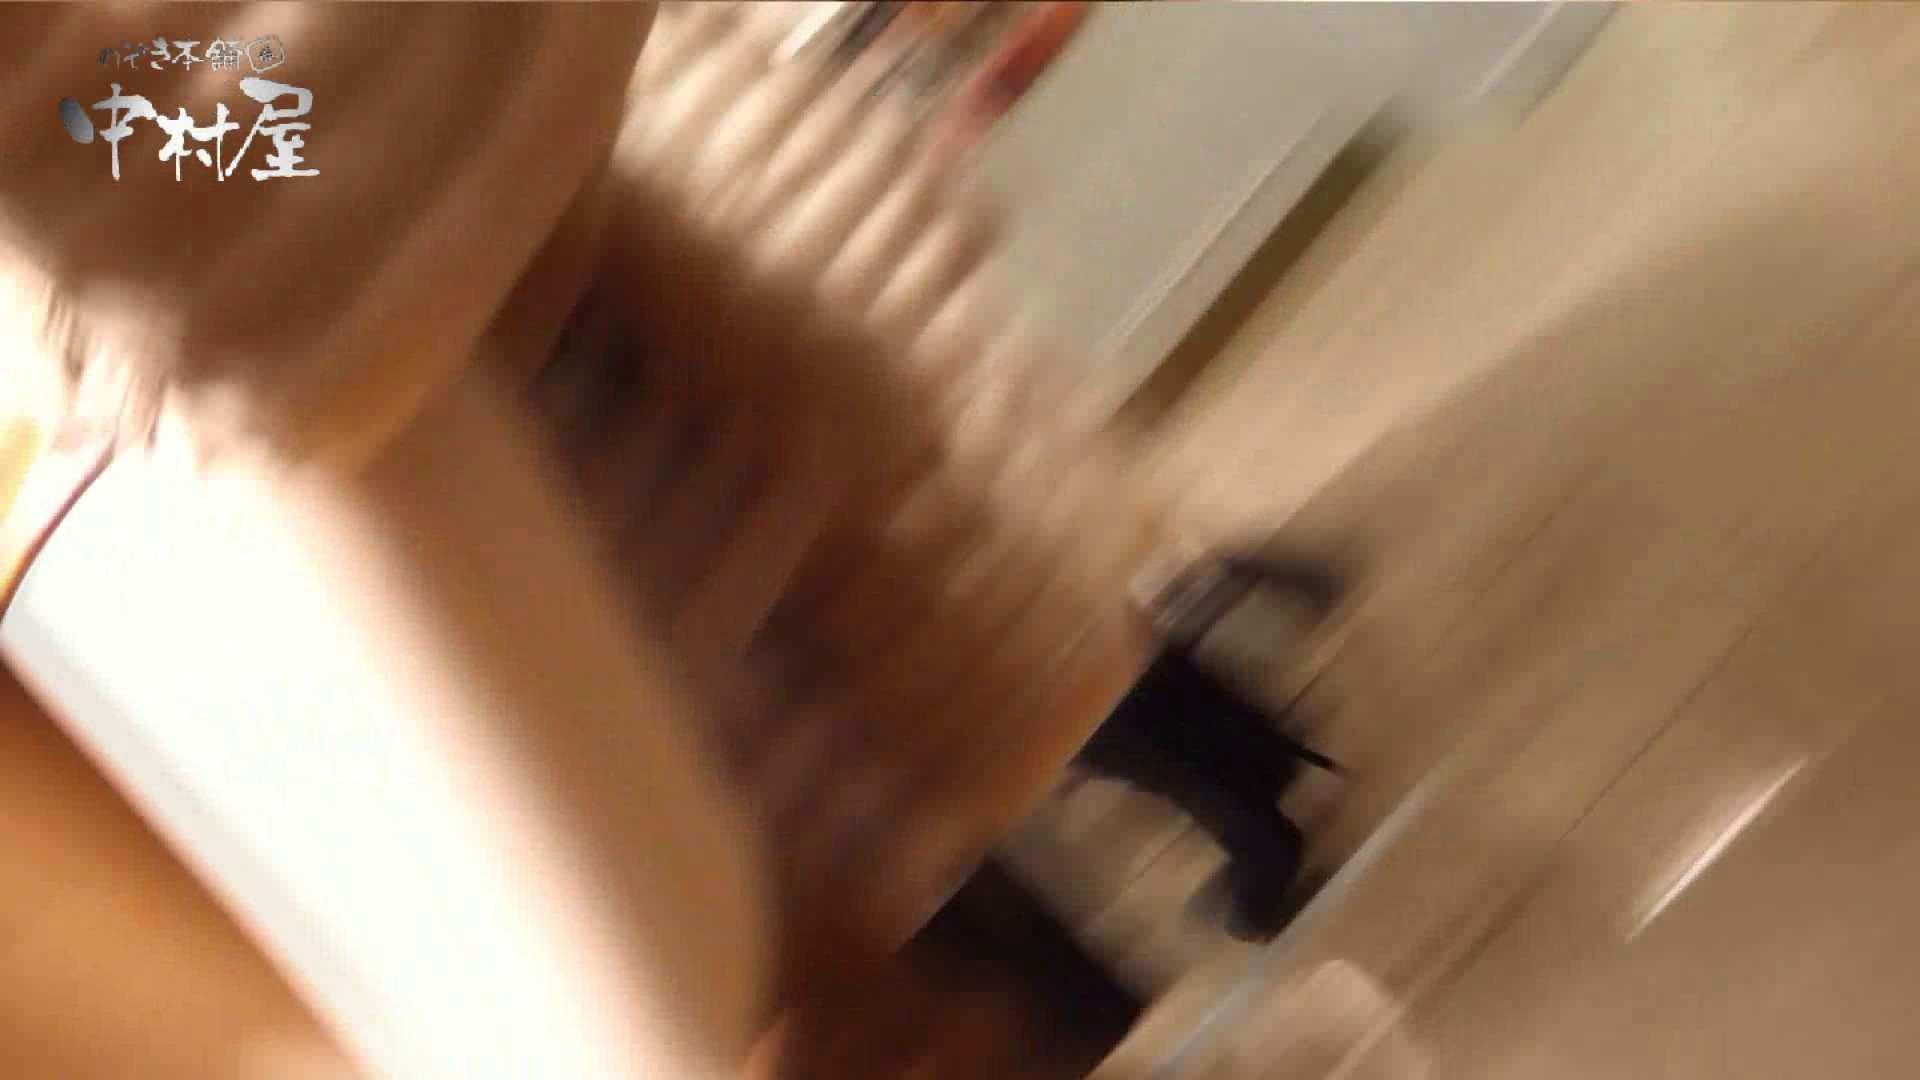 vol.46 可愛いカリスマ店員胸チラ&パンチラ モリマン! パンチラ | OLセックス  76画像 56